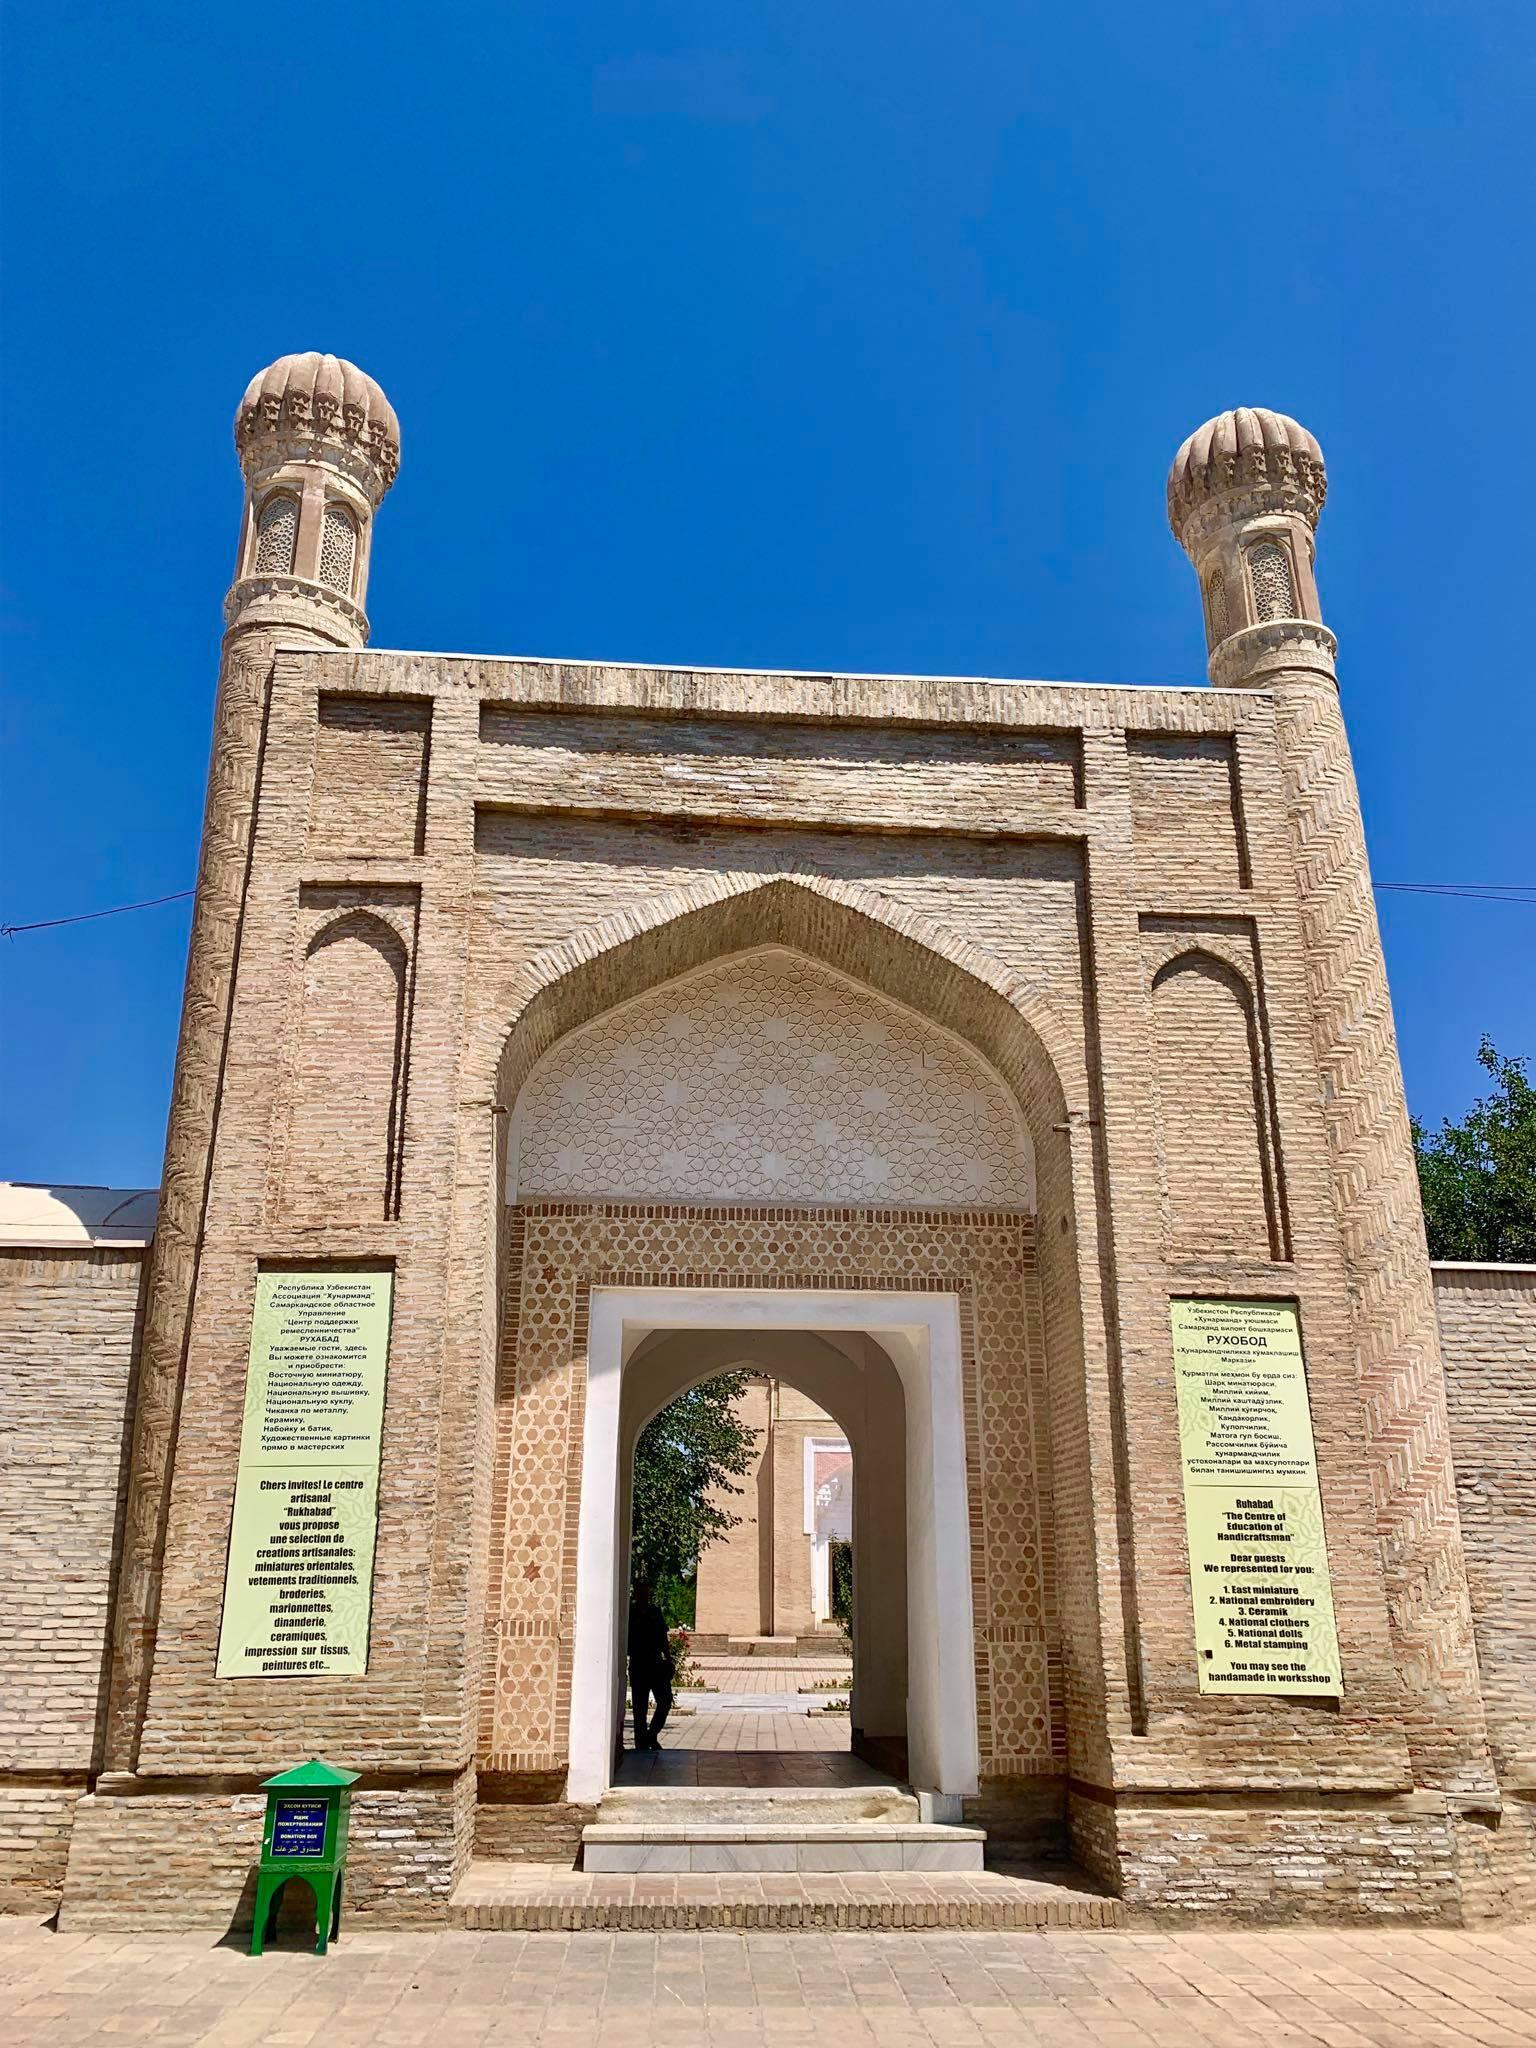 Kach Solo Travels in 2019 Siyab Bazaar and Registan on my first day in Samarkand2.jpg